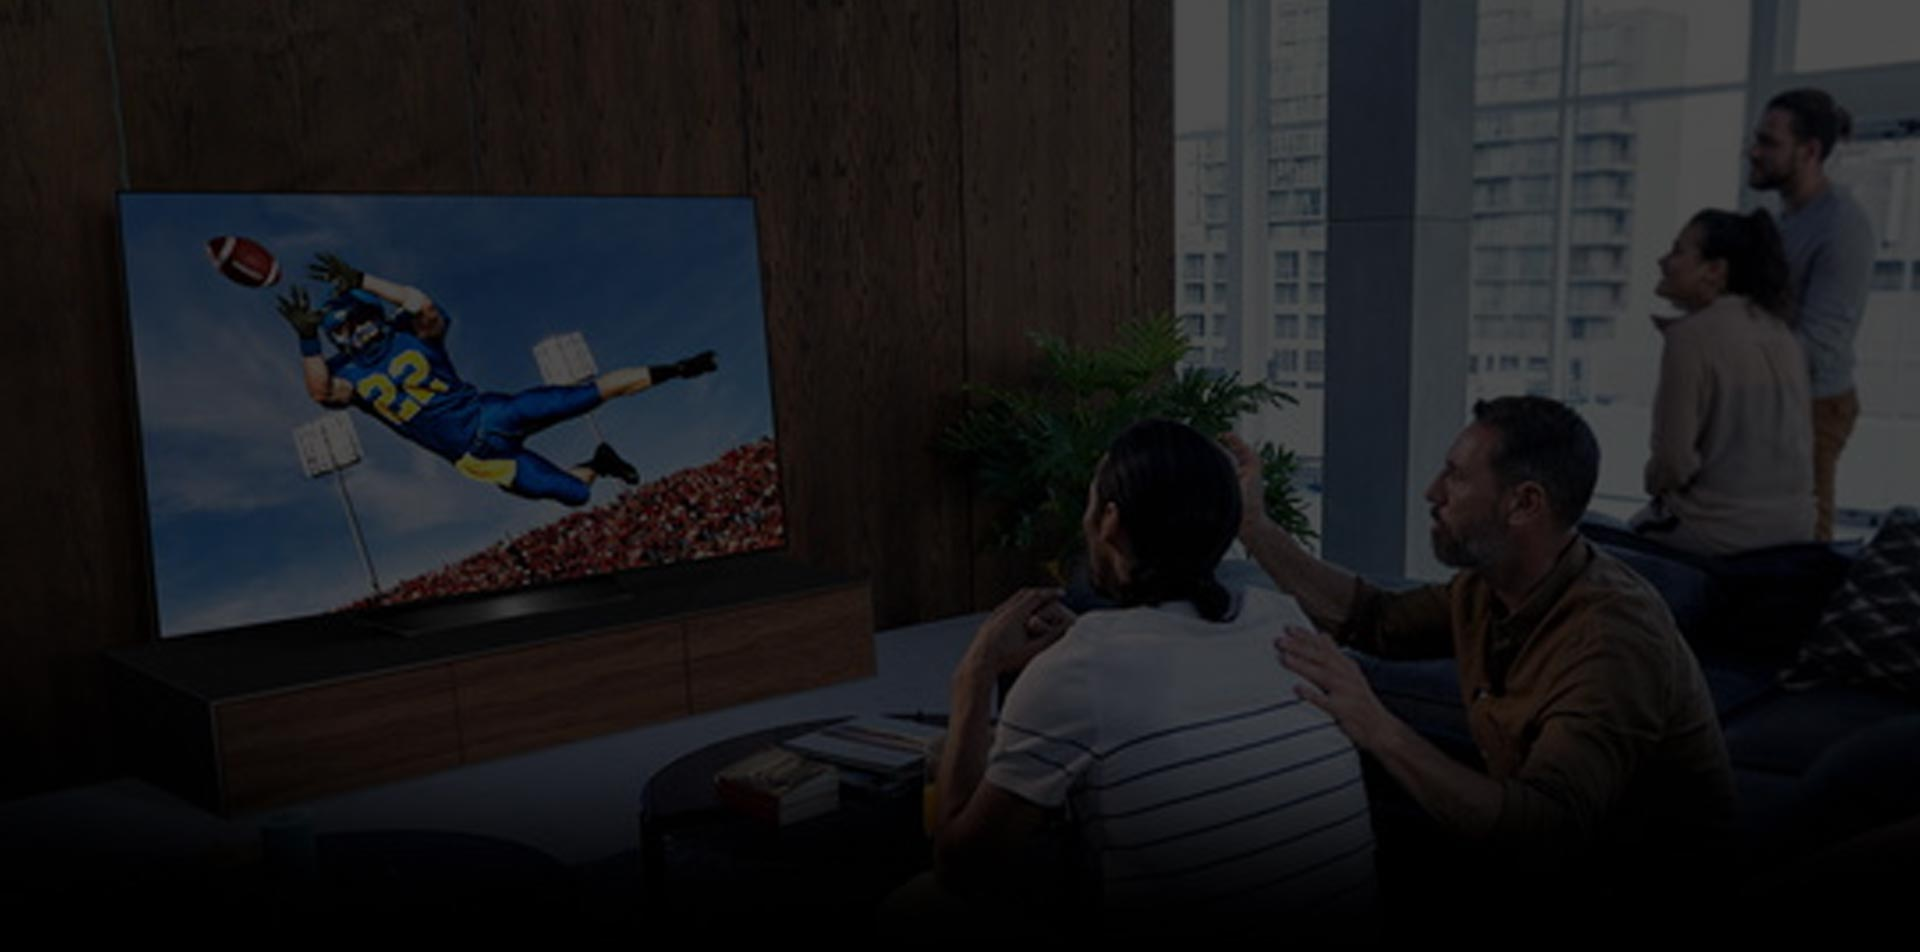 سوالات متداول تعمیر تلویزیون VESTEL